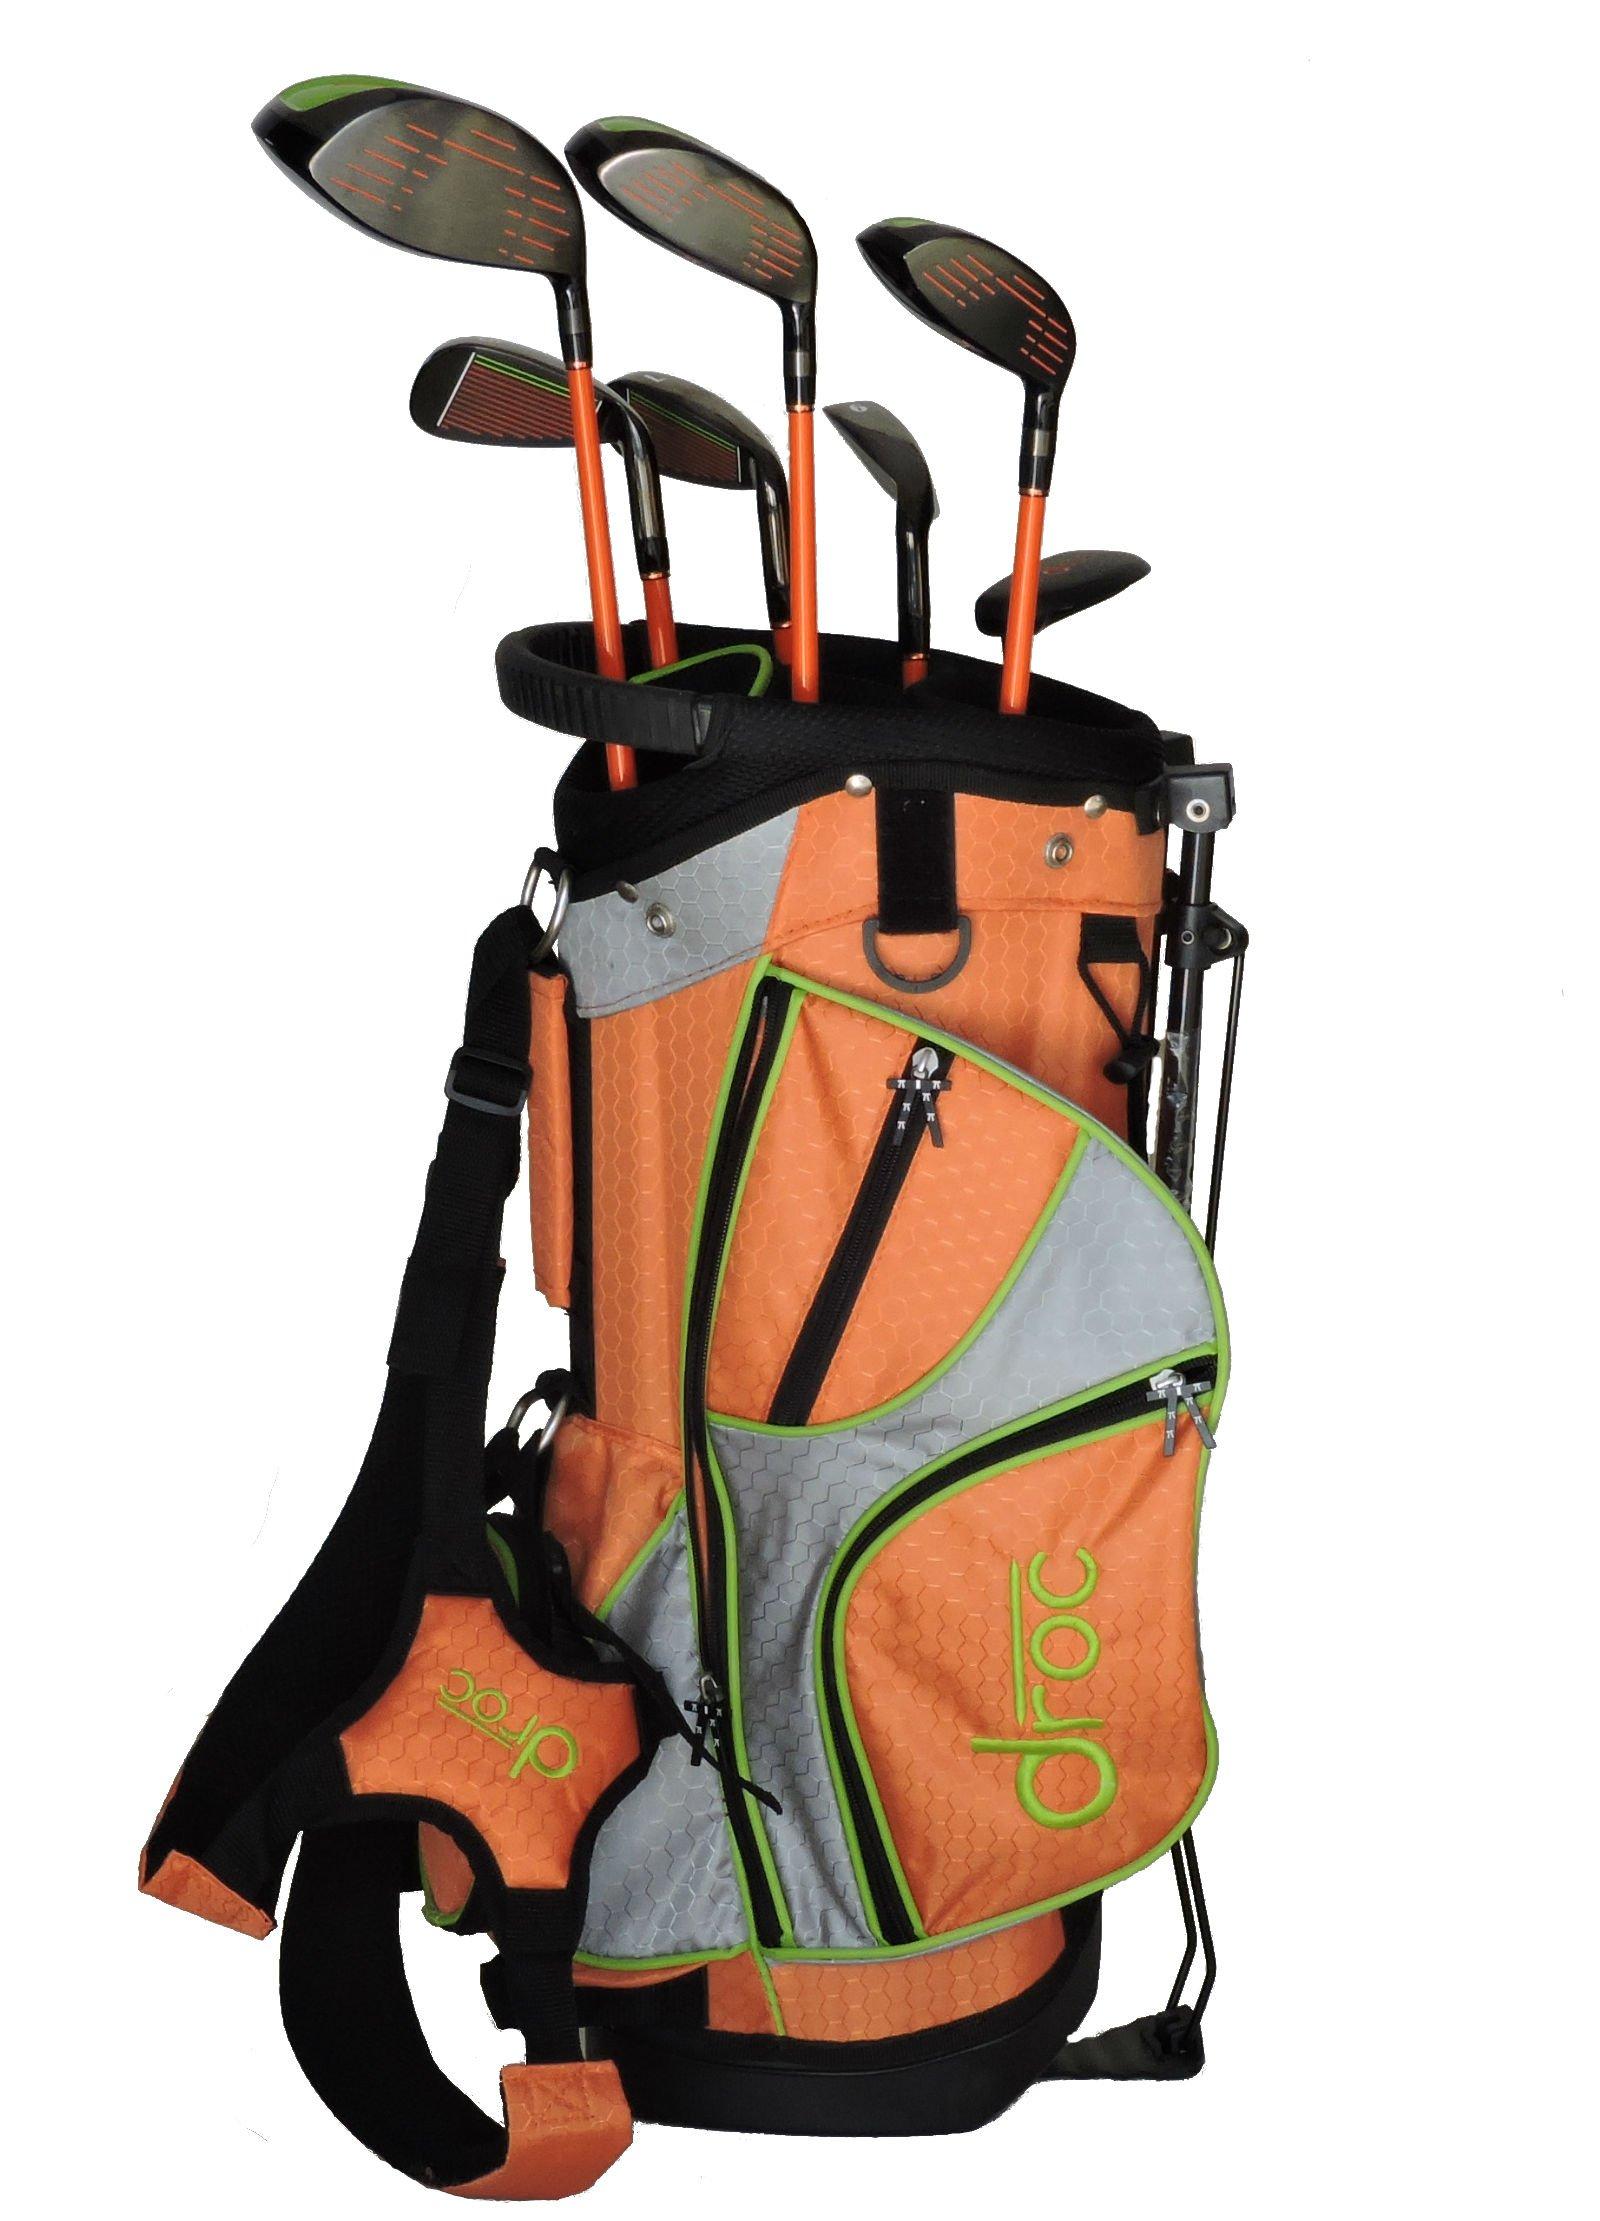 droc - Mica Left Handed Series 7 Pieces Golf Club Set & Golf Bag Ages 3-6 Left Handed (Titanium, Regular) by droc (Image #2)